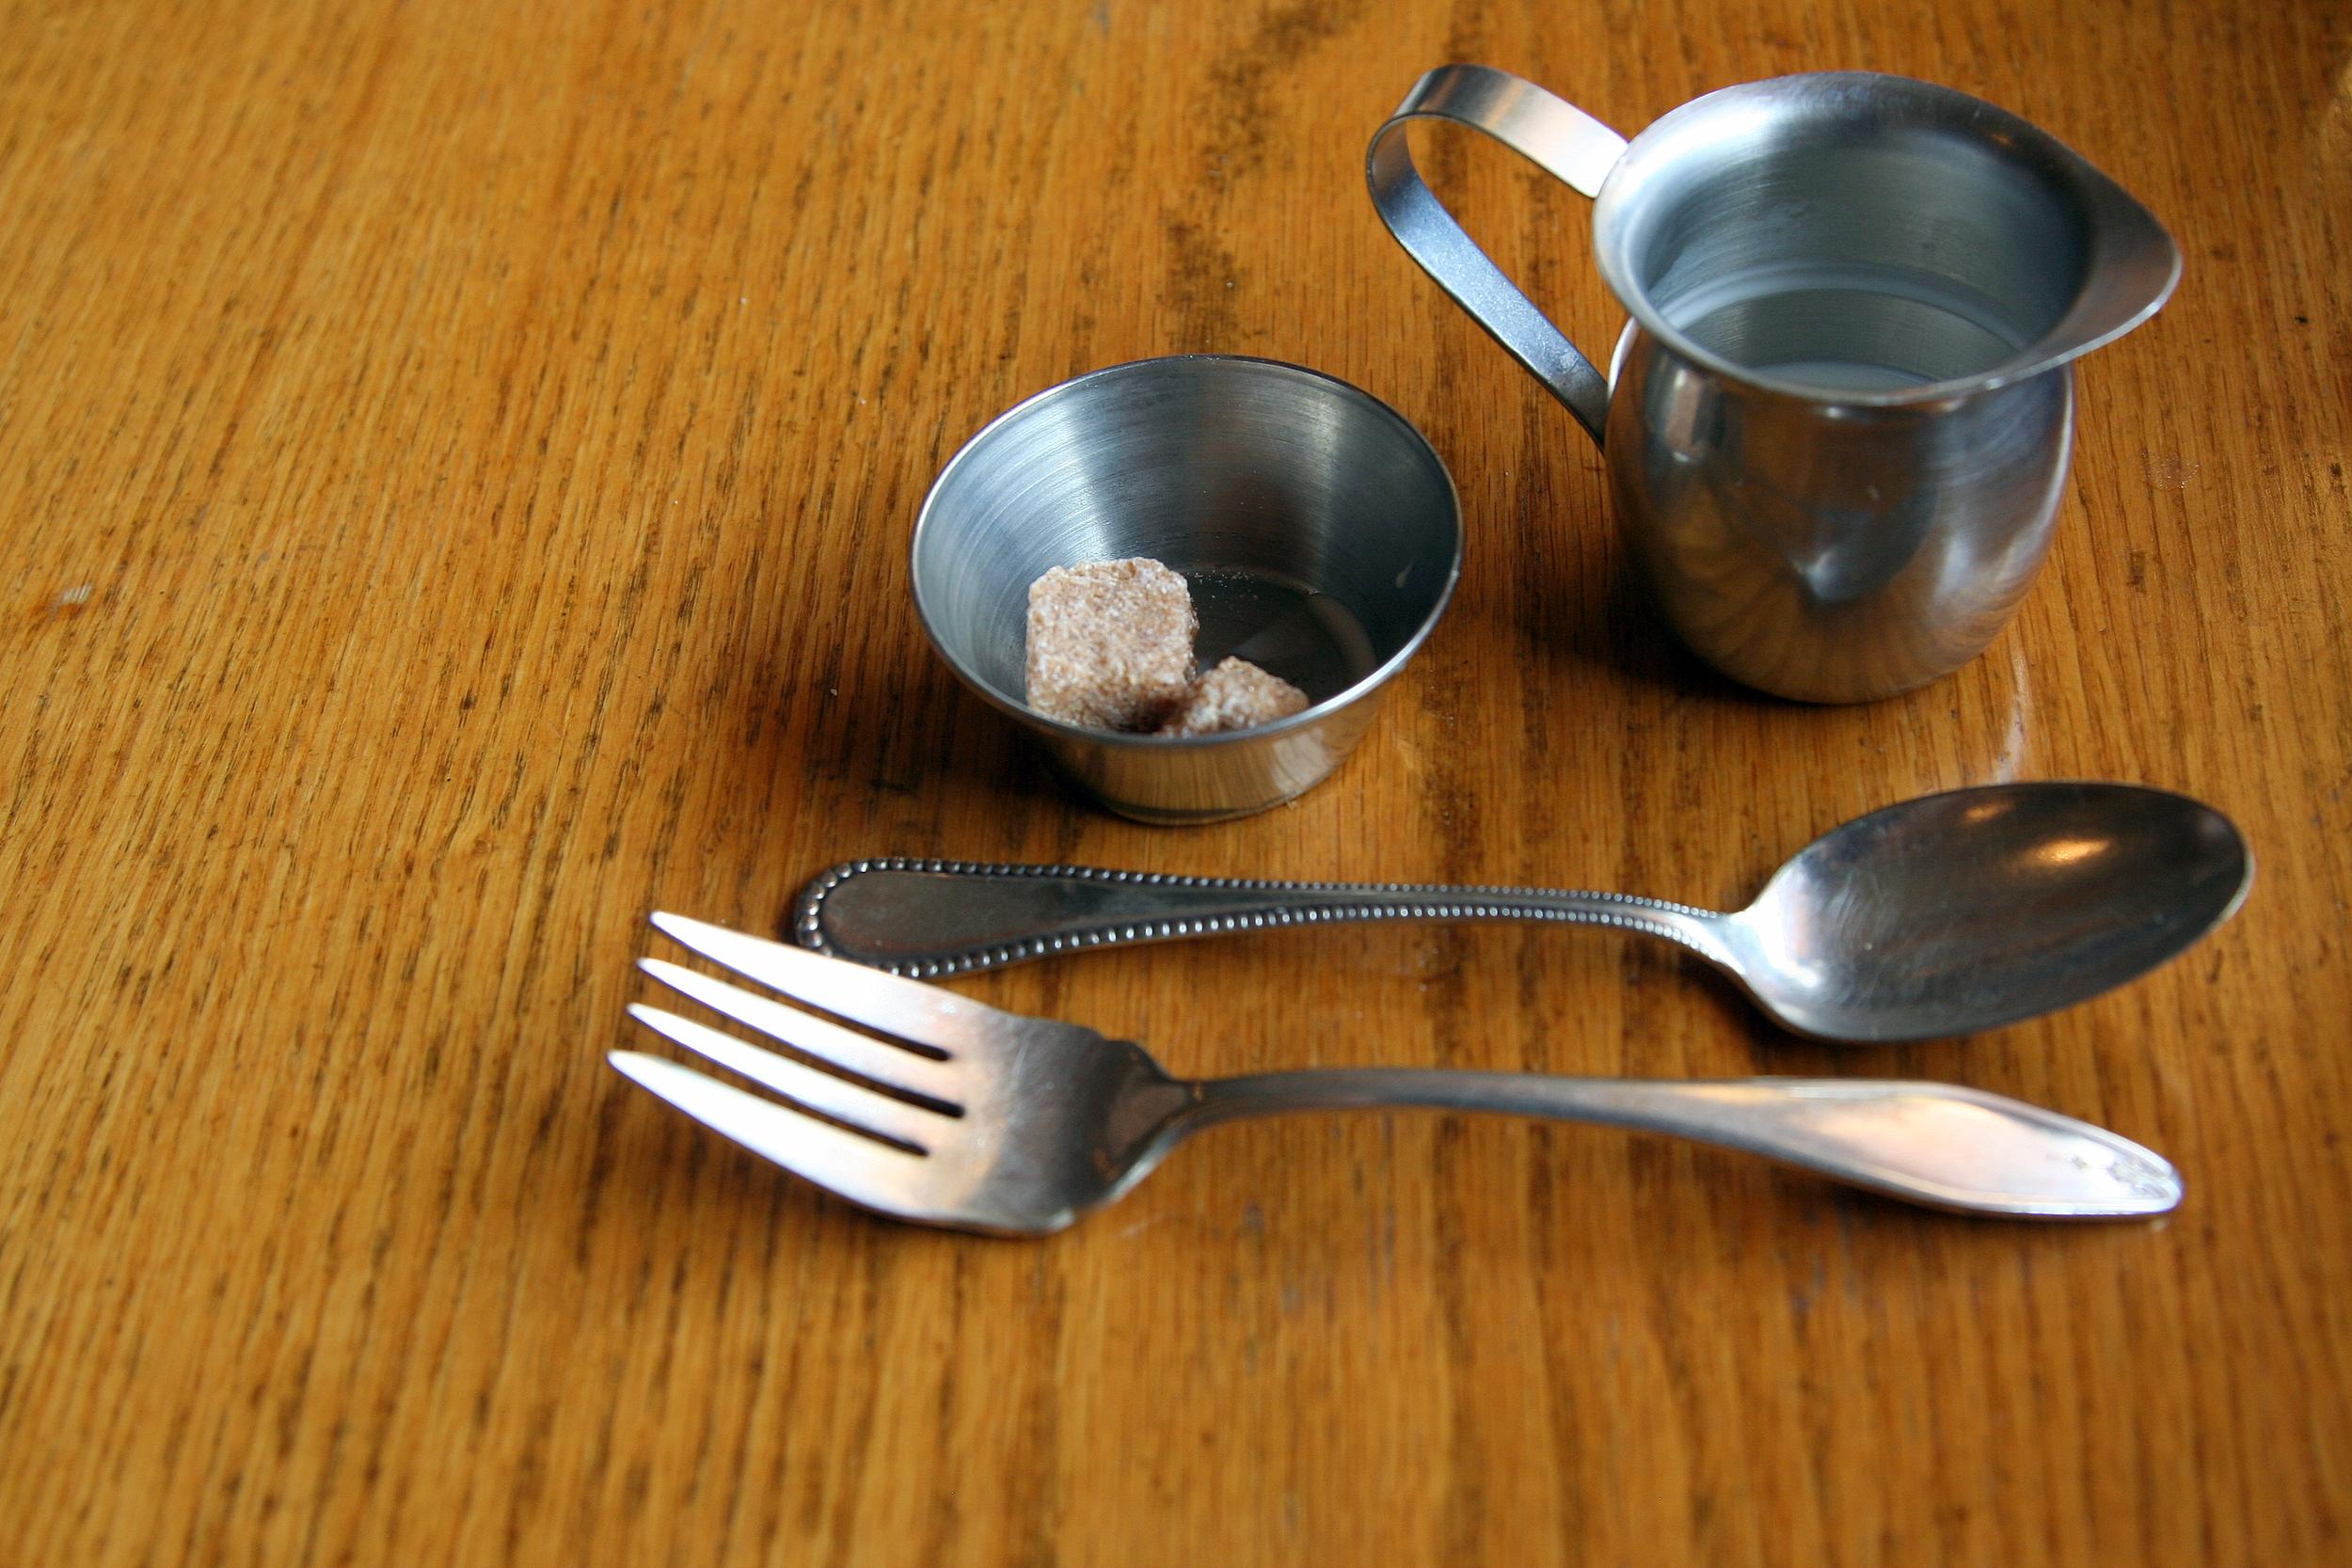 knife & fork spoon and fork.jpg